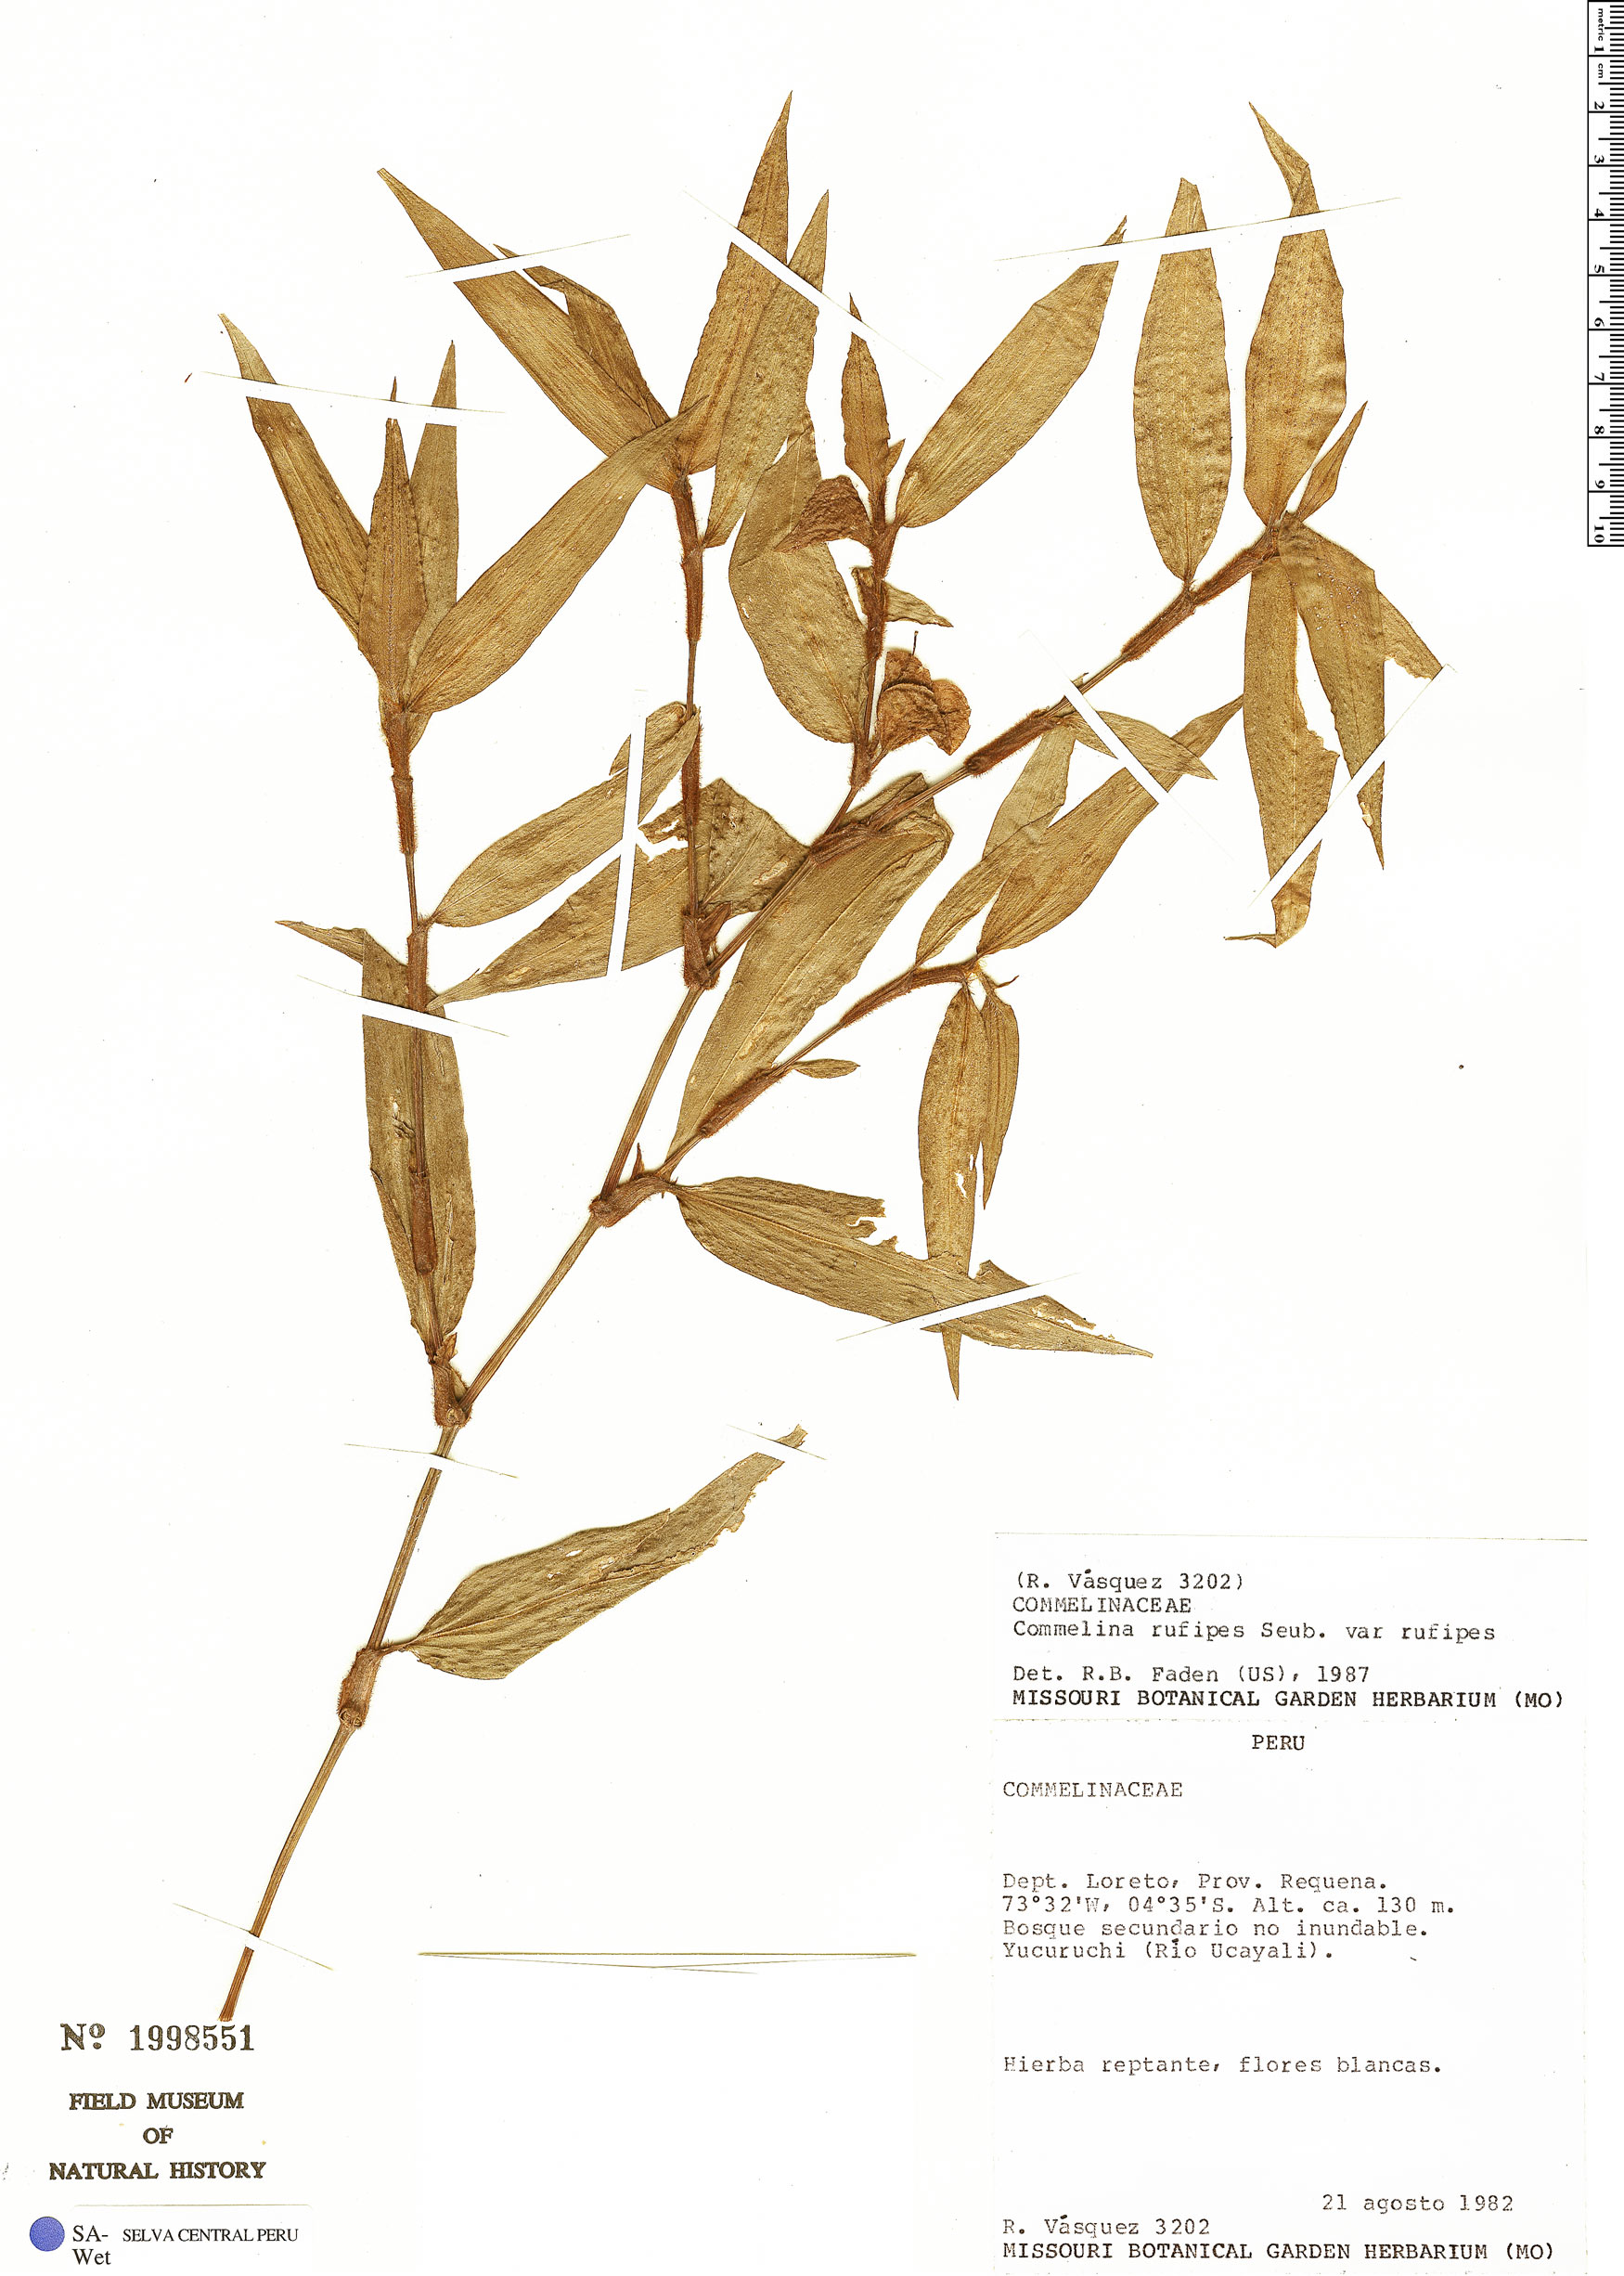 Specimen: Commelina rufipes